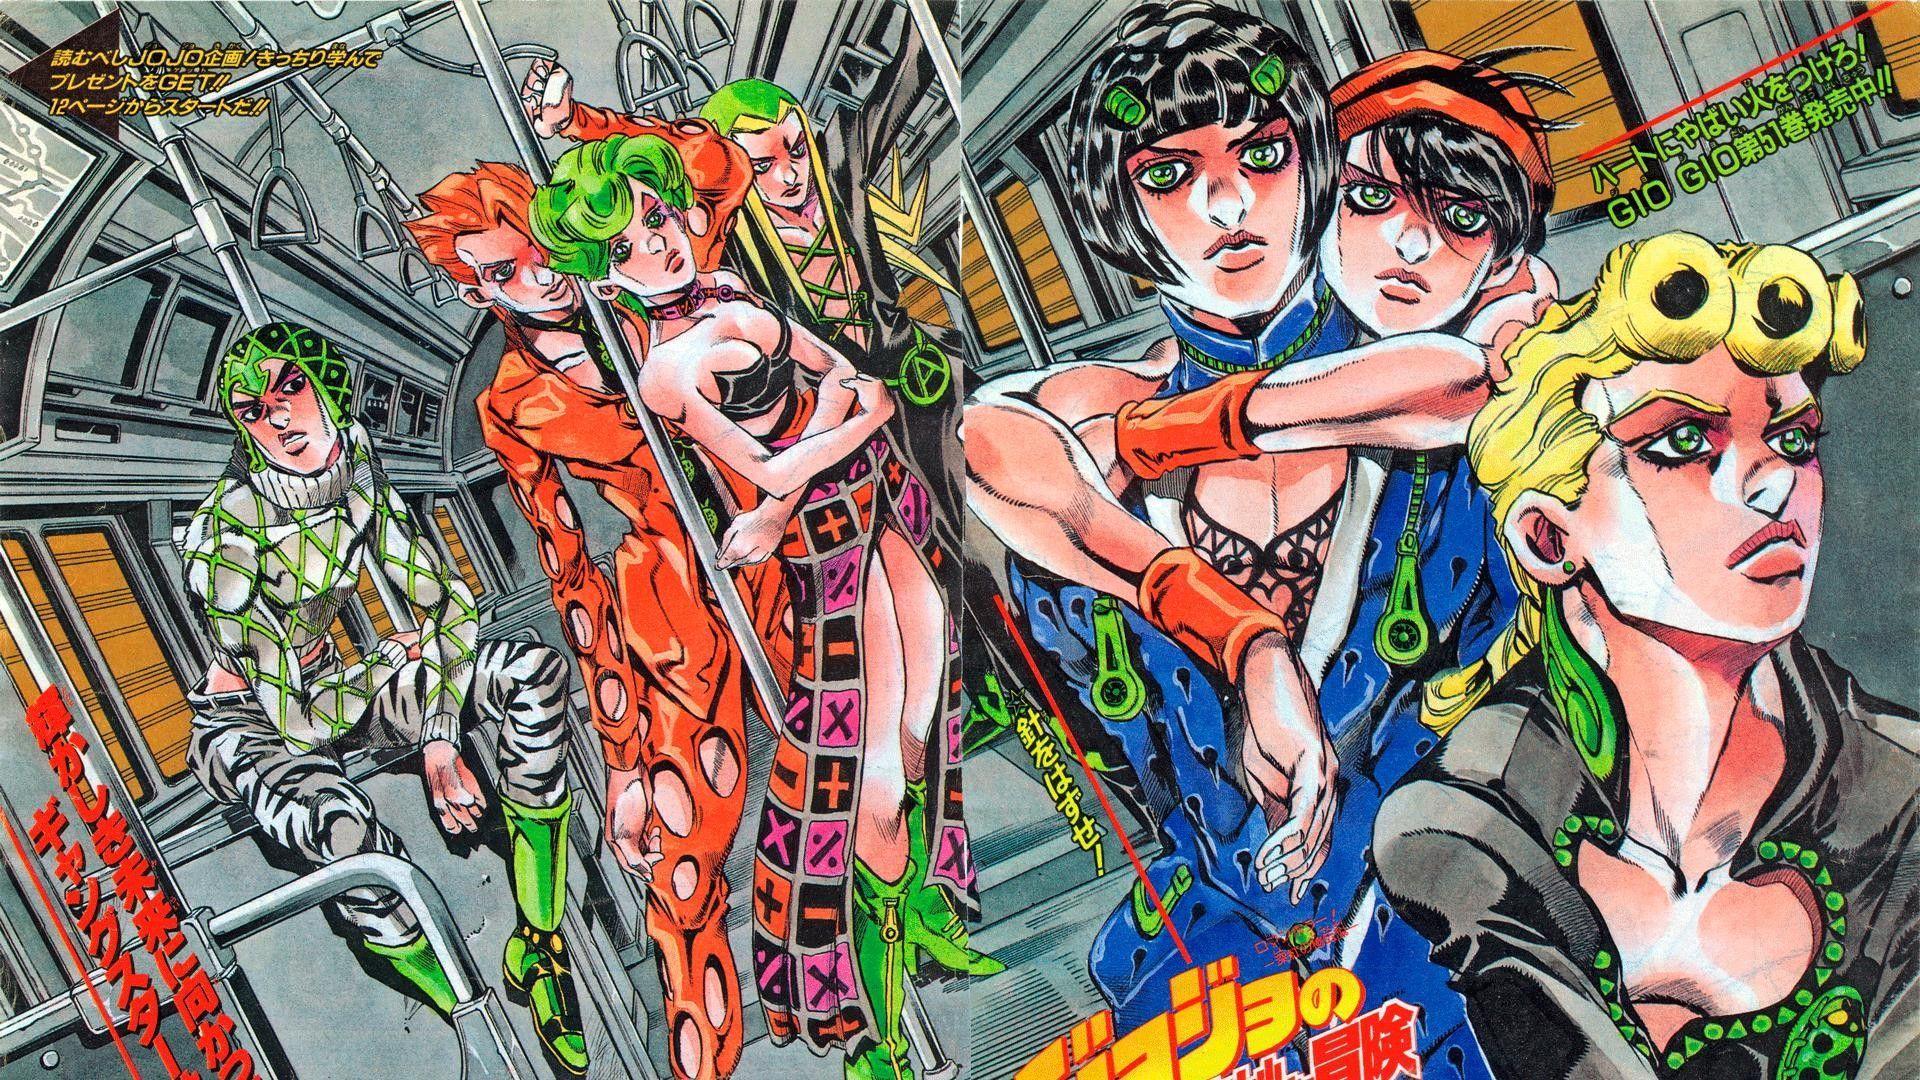 77 Jojo Bizarre Wallpapers On Wallpaperplay Jojo Bizarre Anime Jojo